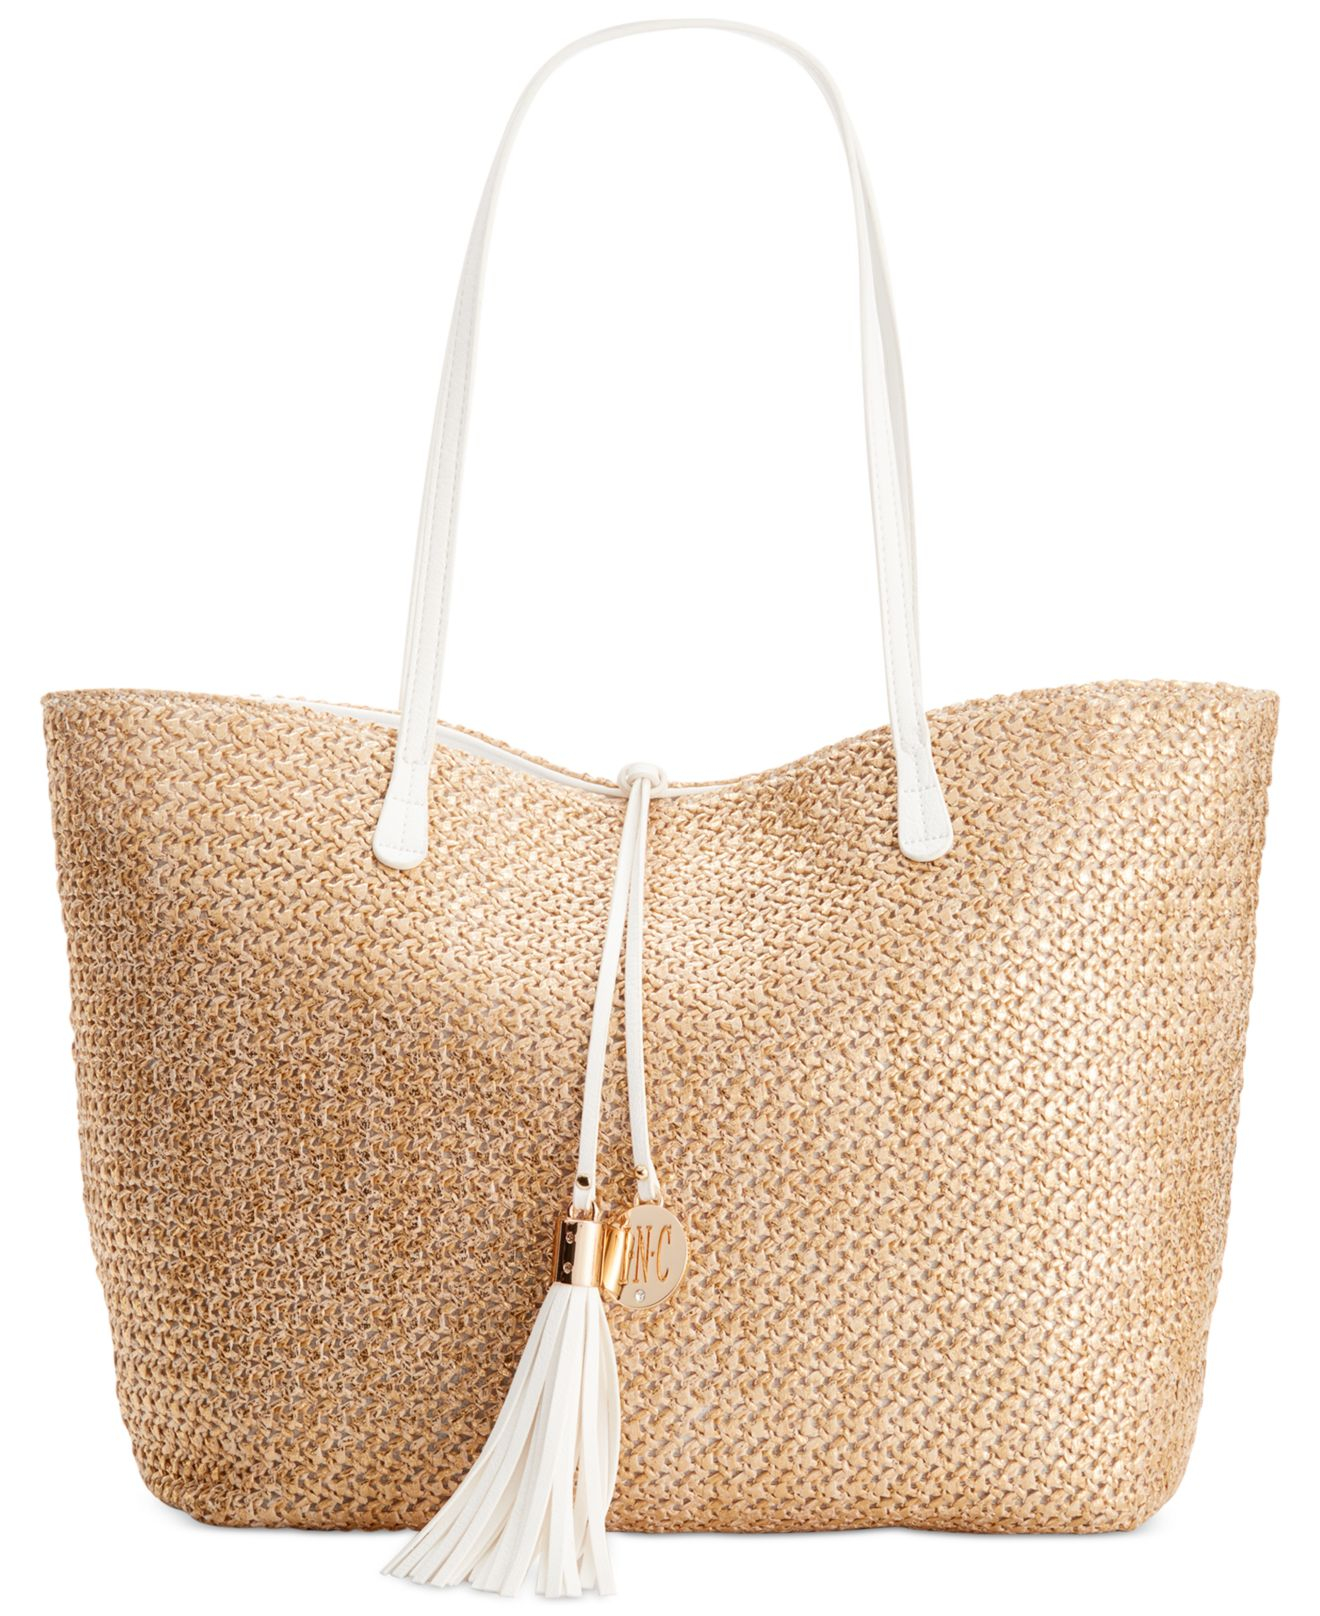 Inc International Concepts Tropical Beach Bag In Metallic